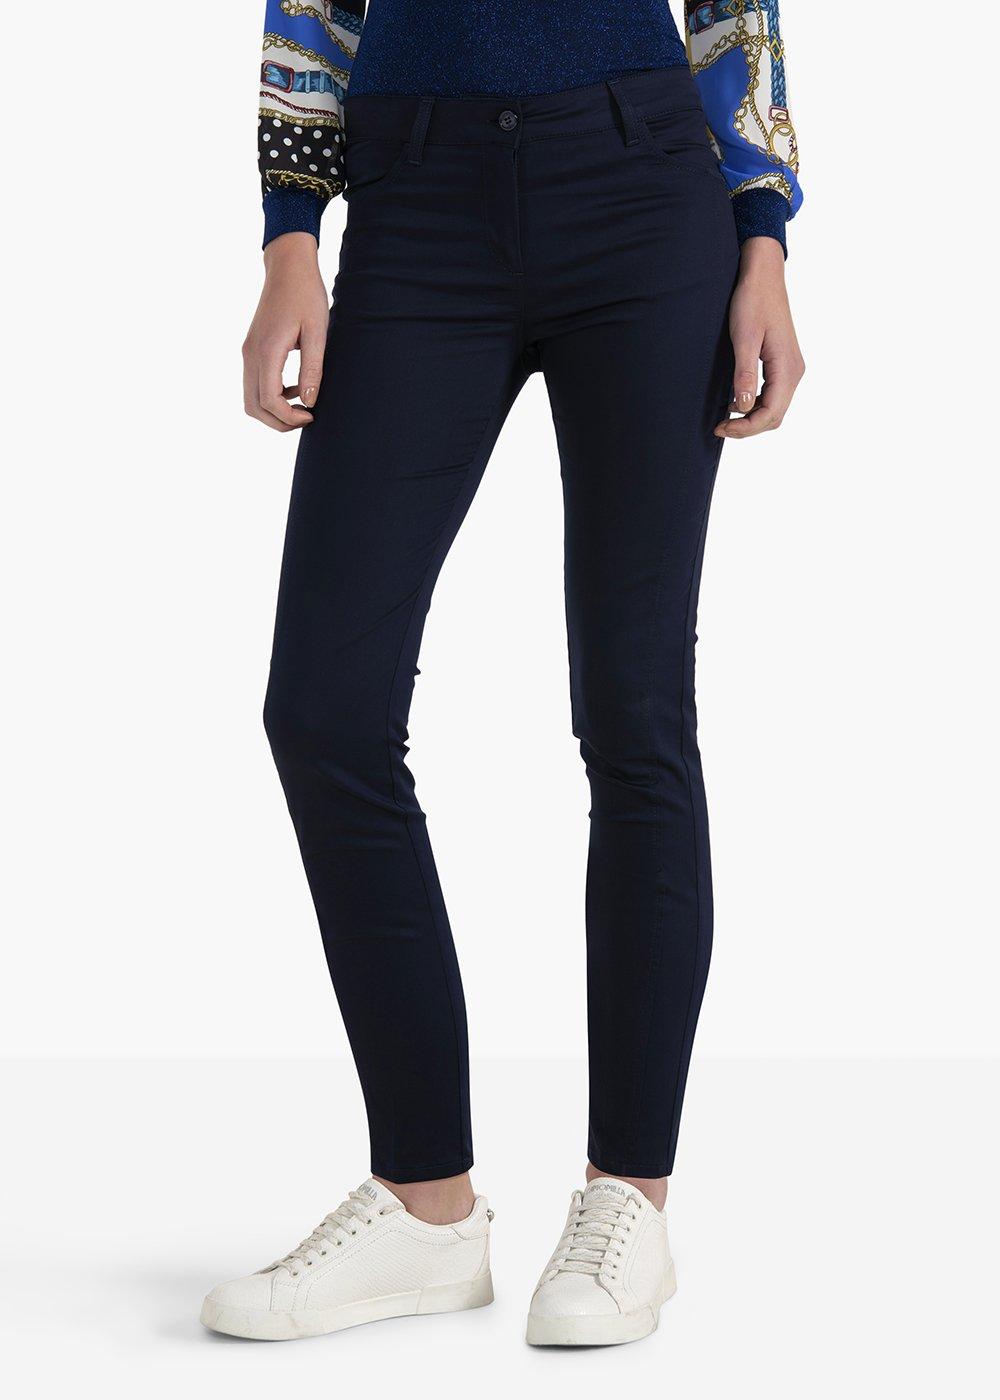 Kate Runner pants in polycotton fabric - Medium Blue - Woman